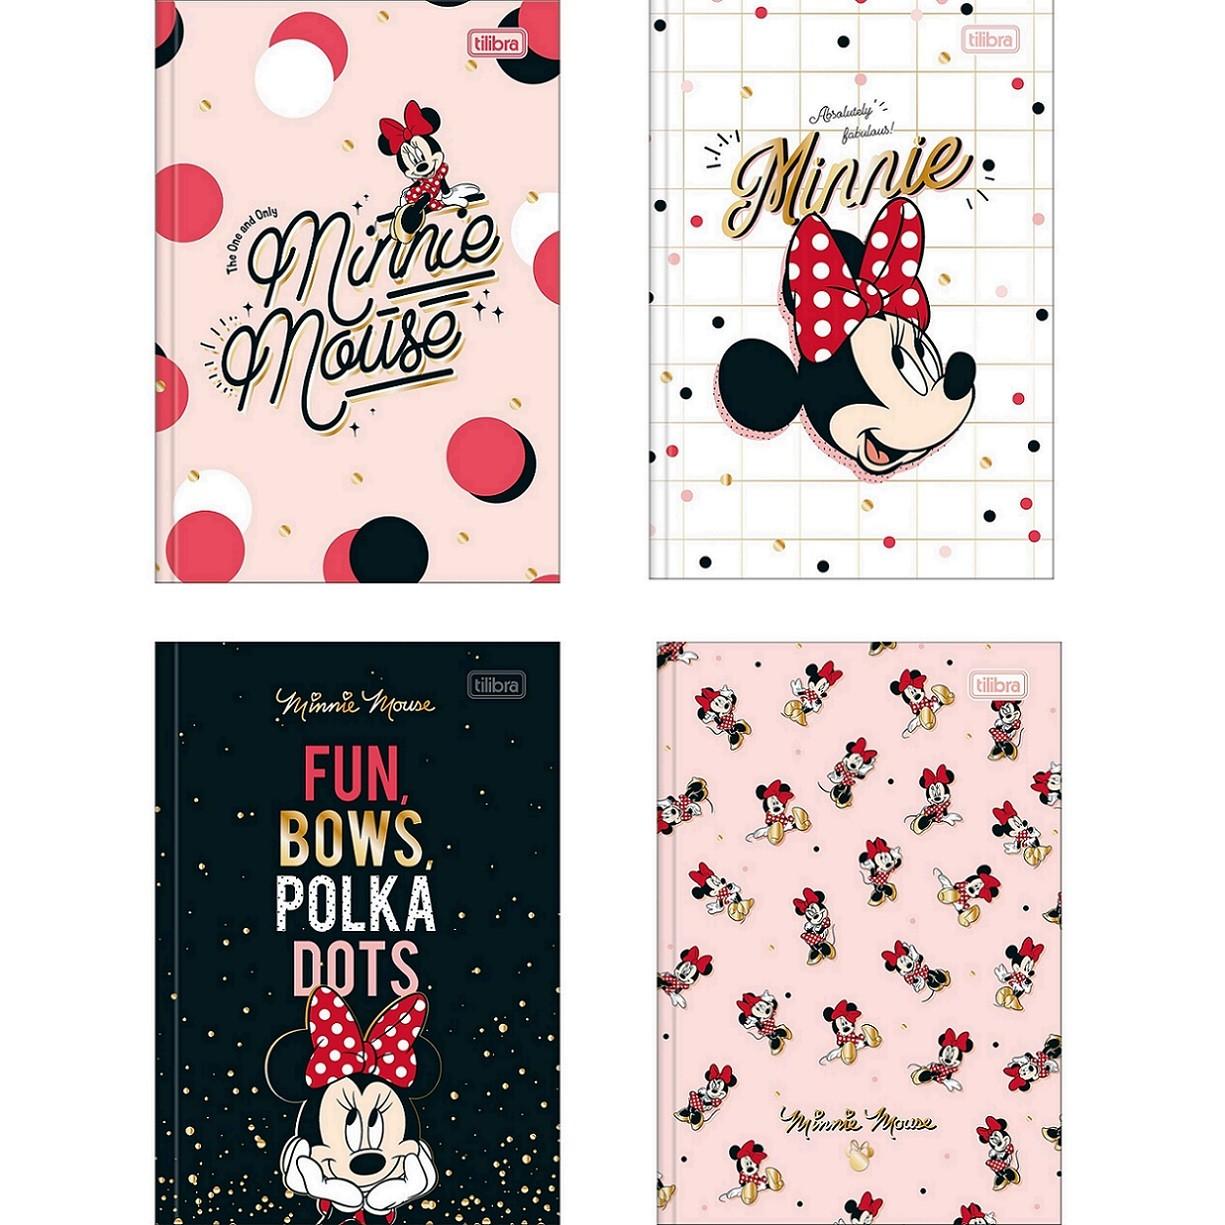 Caderno Brochura Capa Dura Minnie Mouse 80 Fls Tilibra